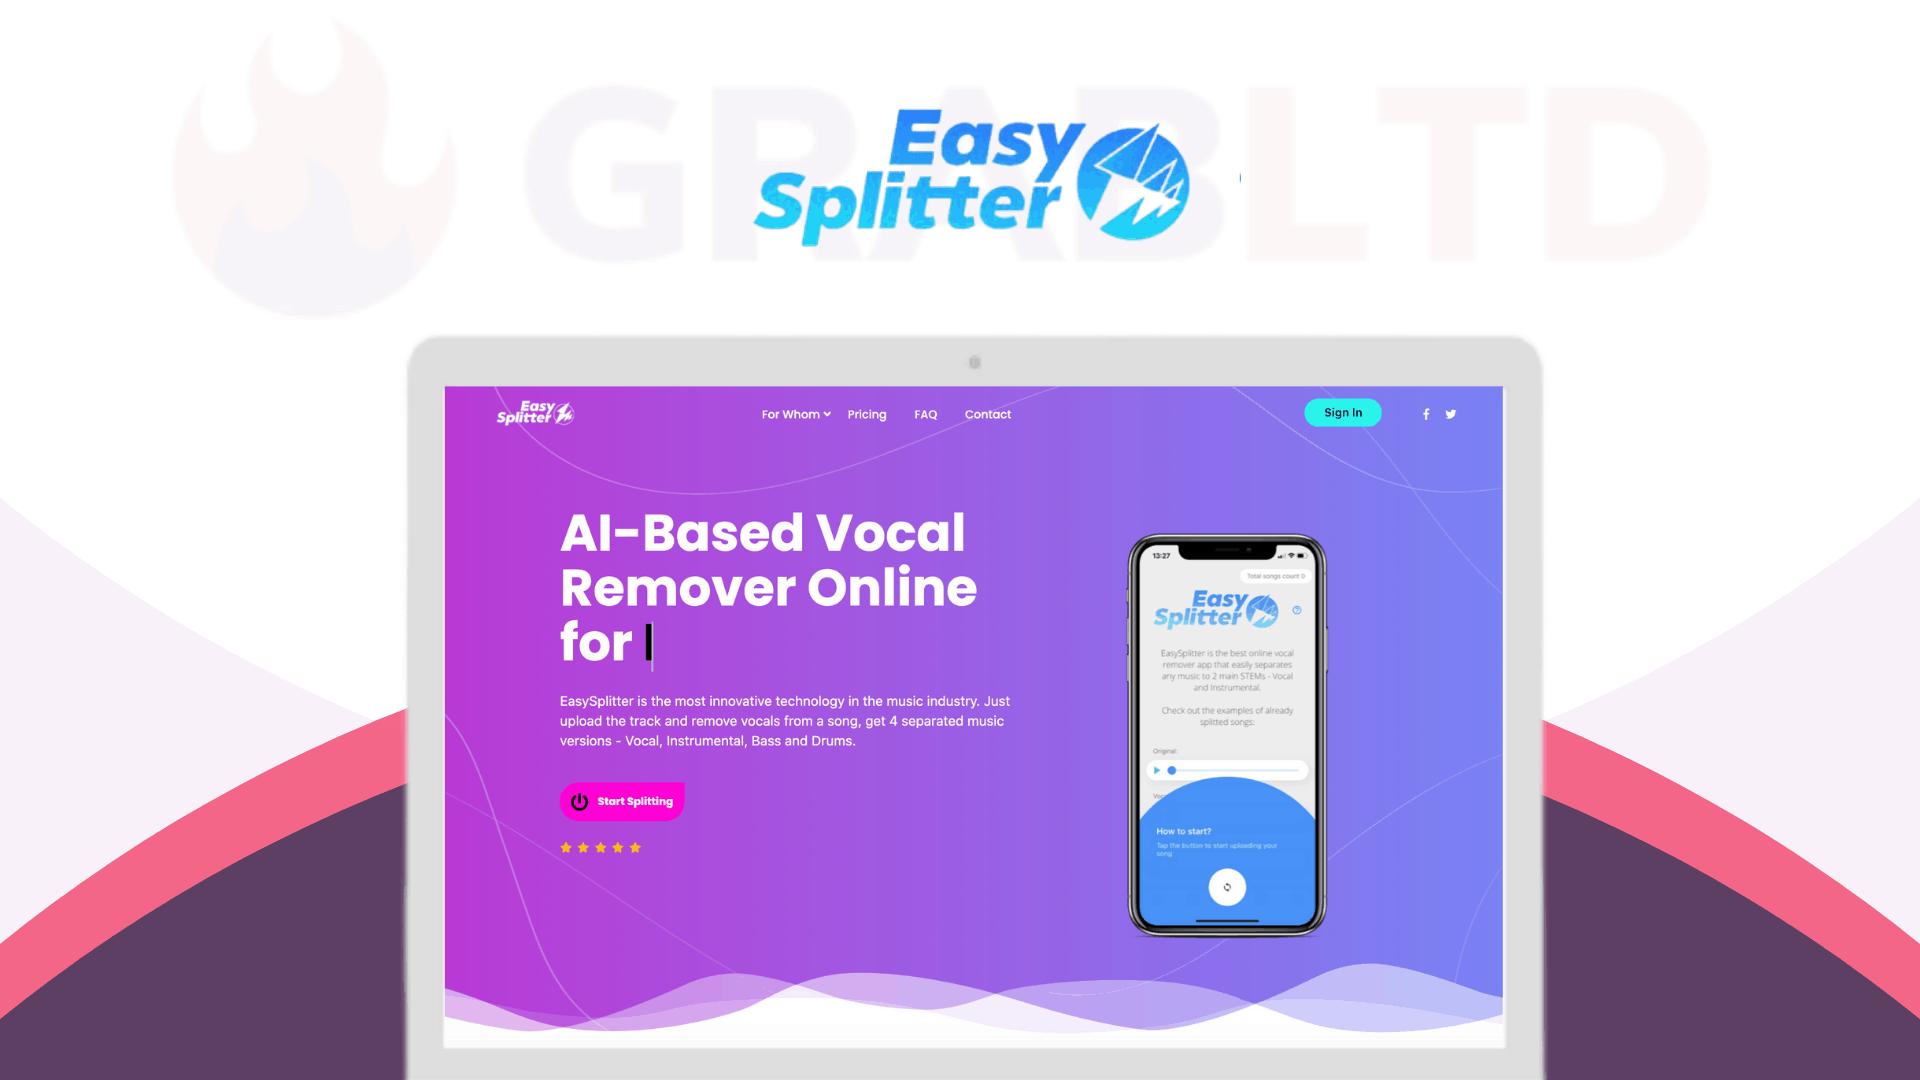 EasySplitter | AI-Based Vocal Remover Online 1